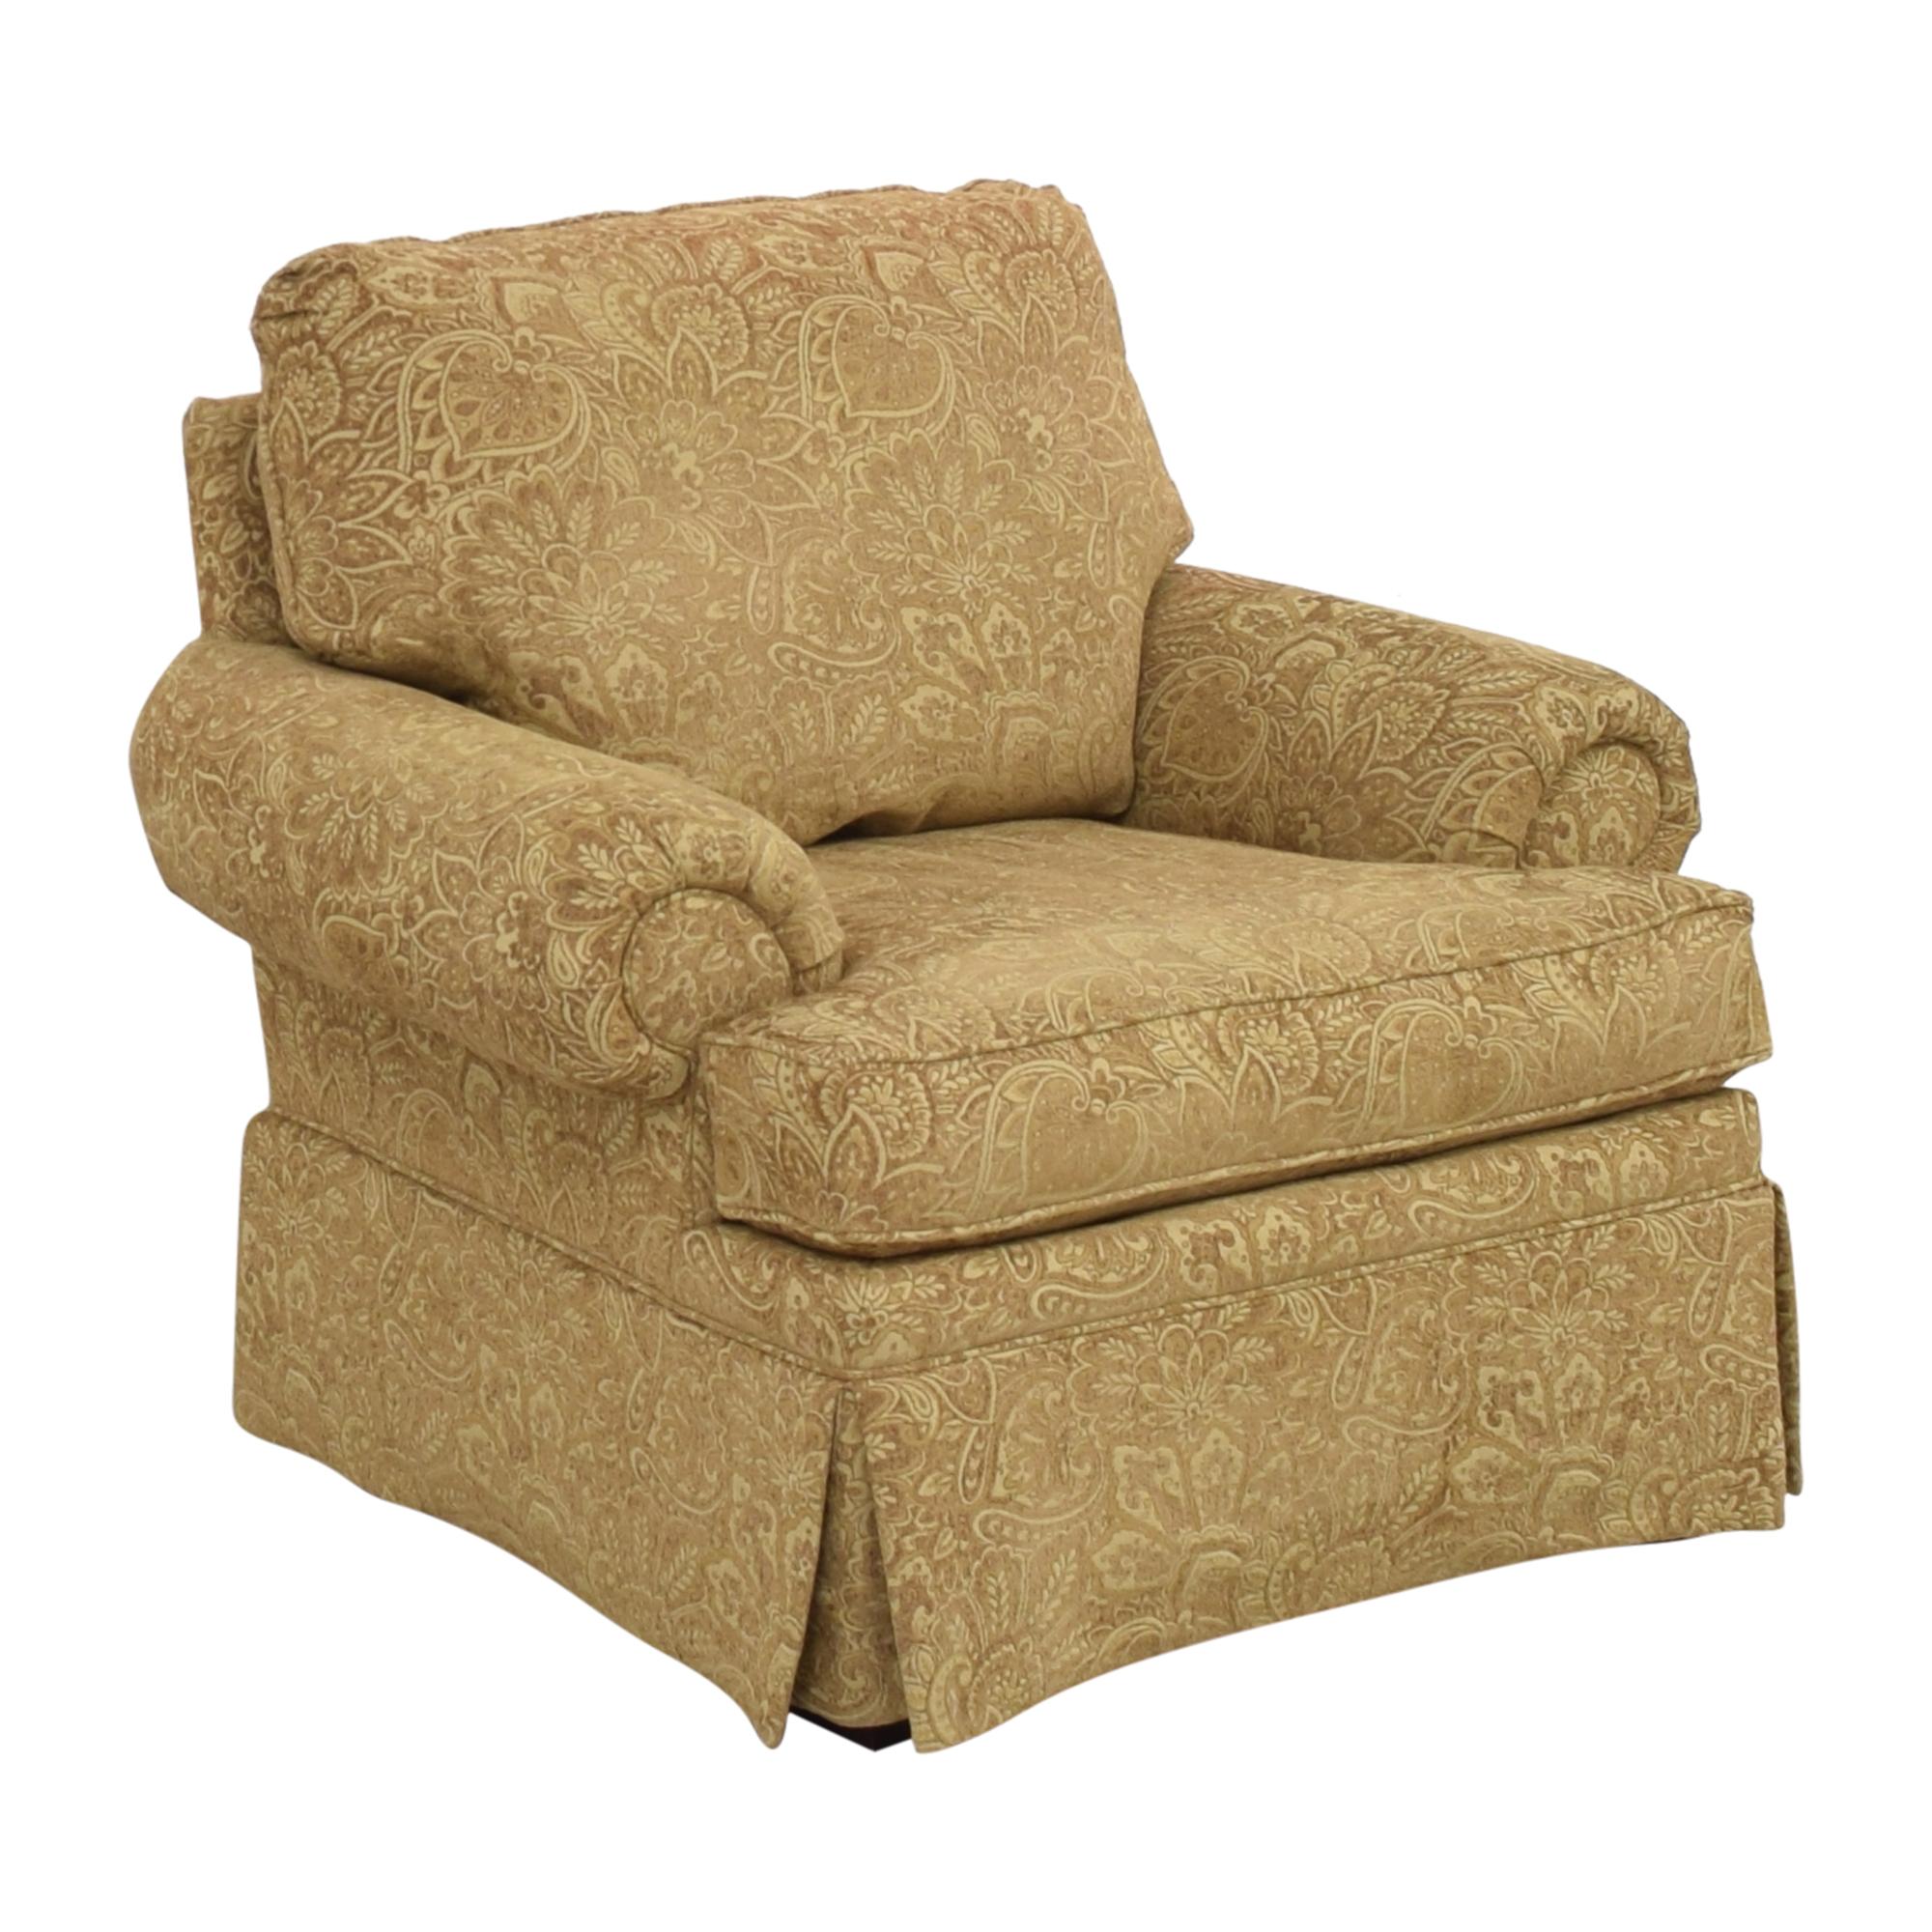 Clayton Marcus Clayton Marcus Lauren Chair Chairs